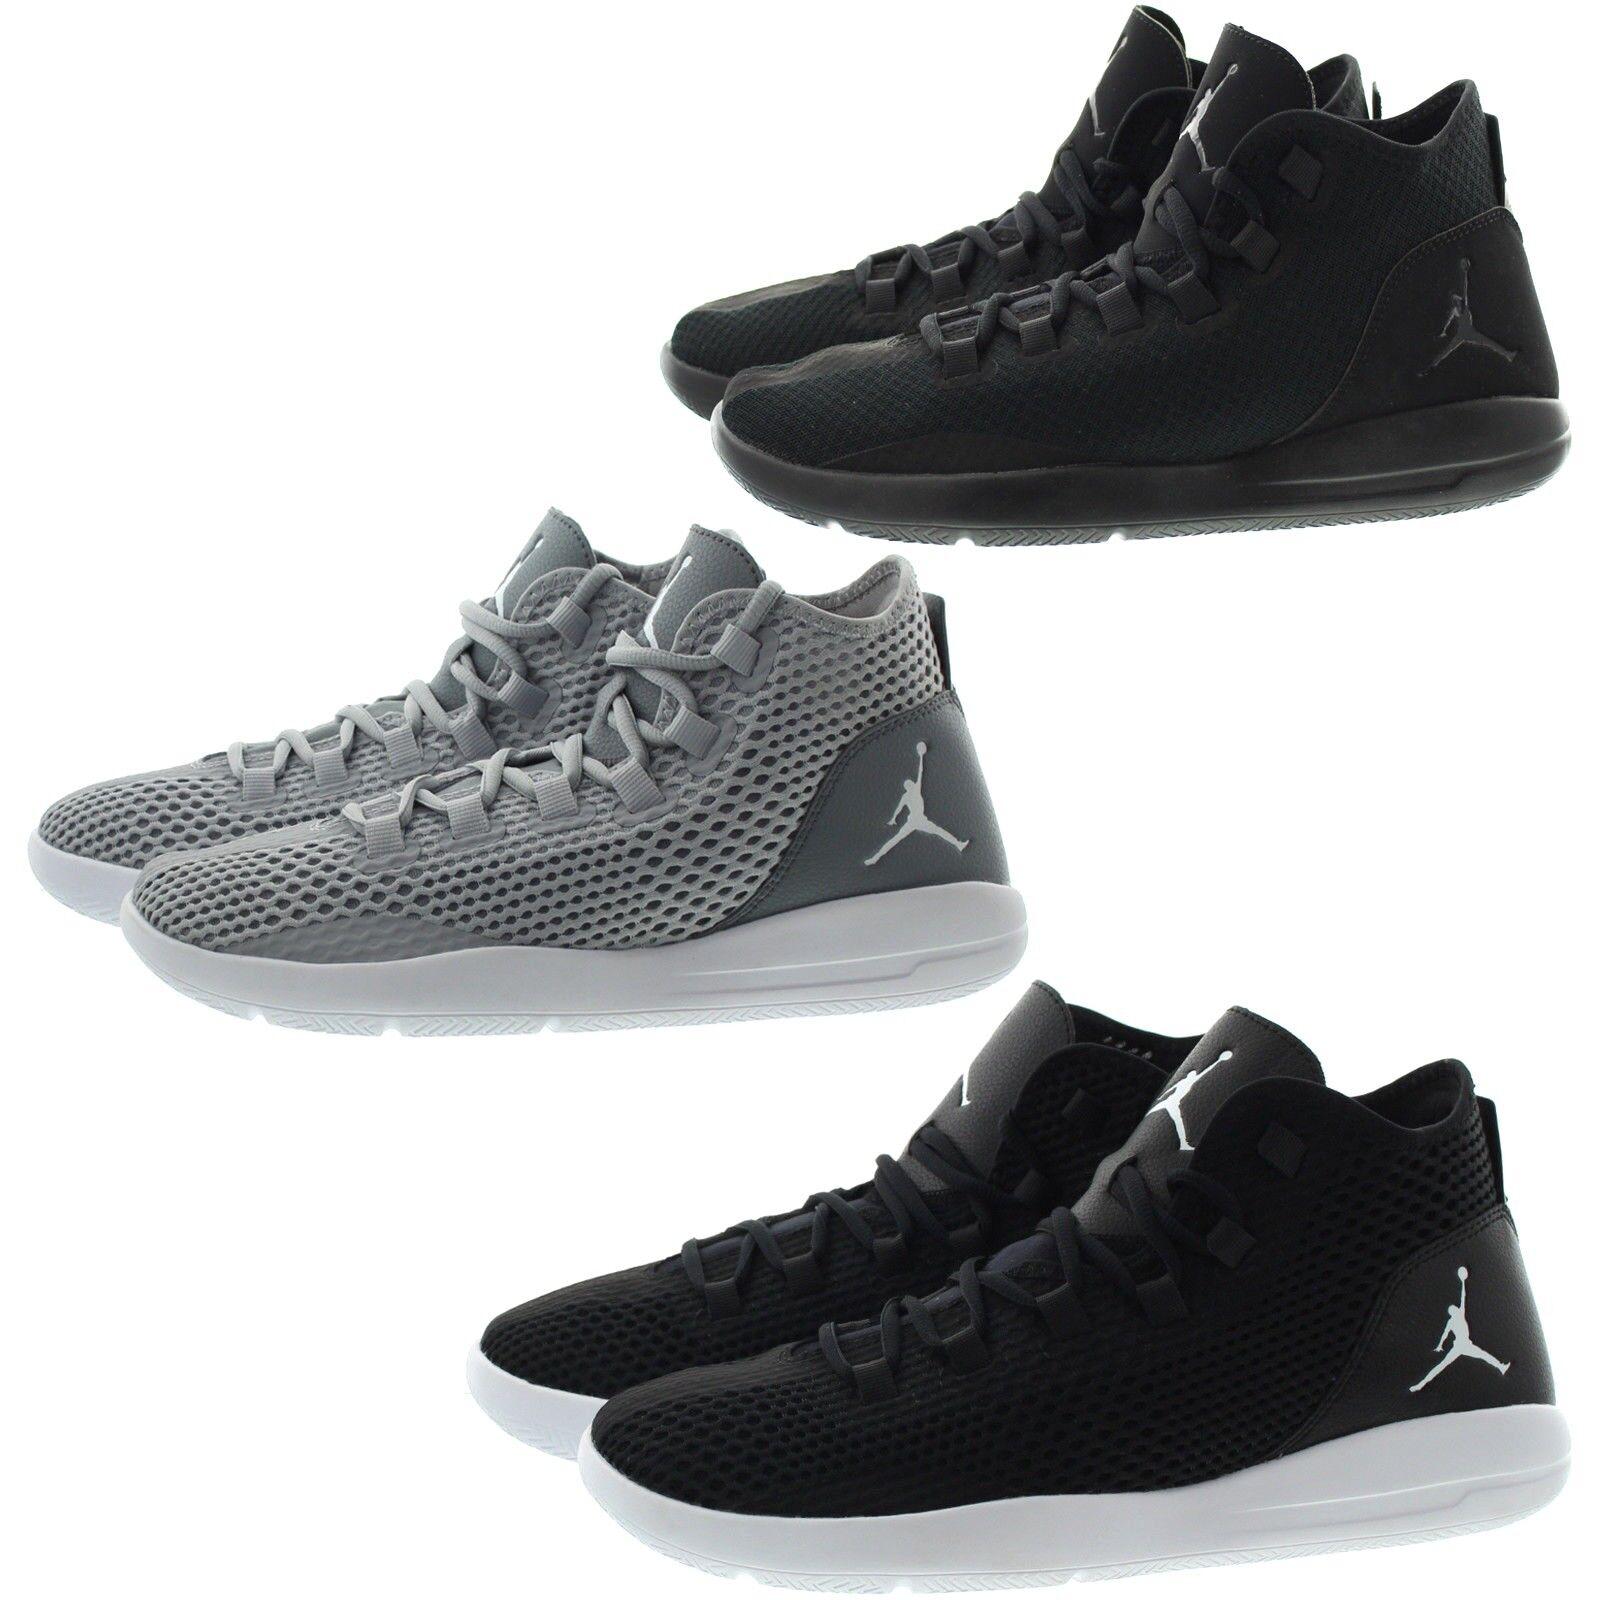 Nike 834064 Mens Air Jordan Reveal Lightweight Basketball shoes Sneakers